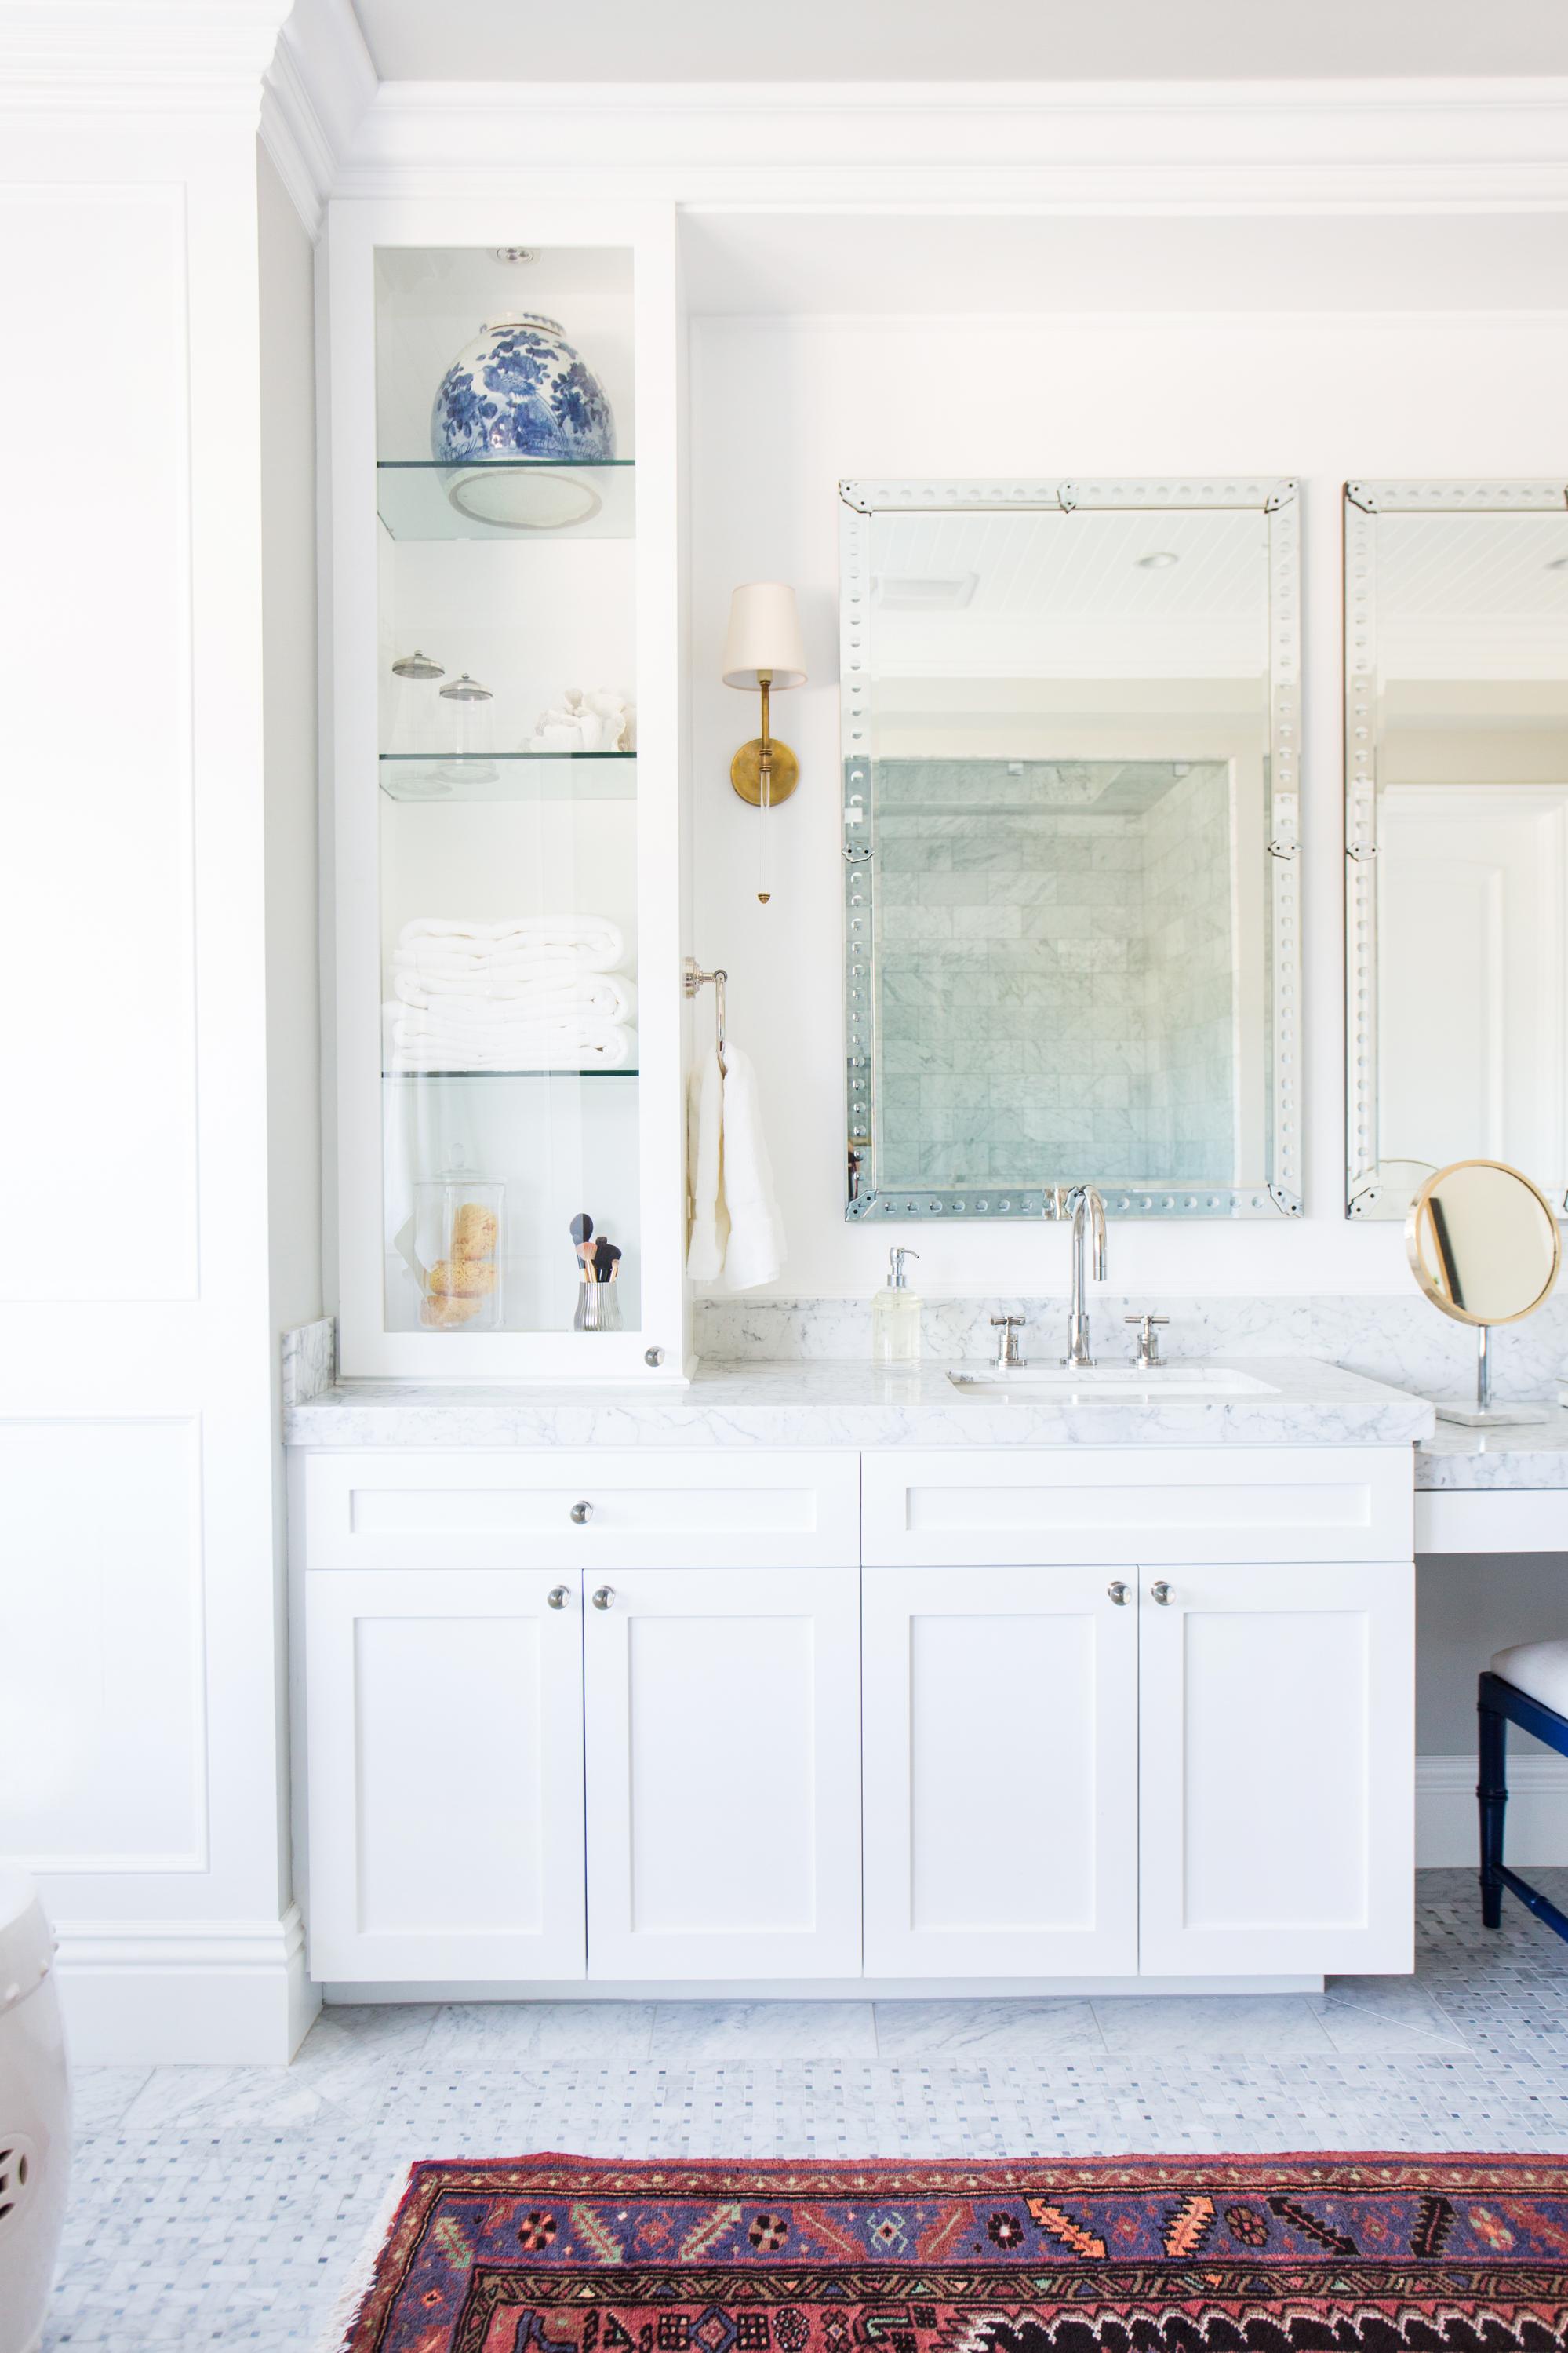 Studio McGee - Pacific Palisades Master Bathroom